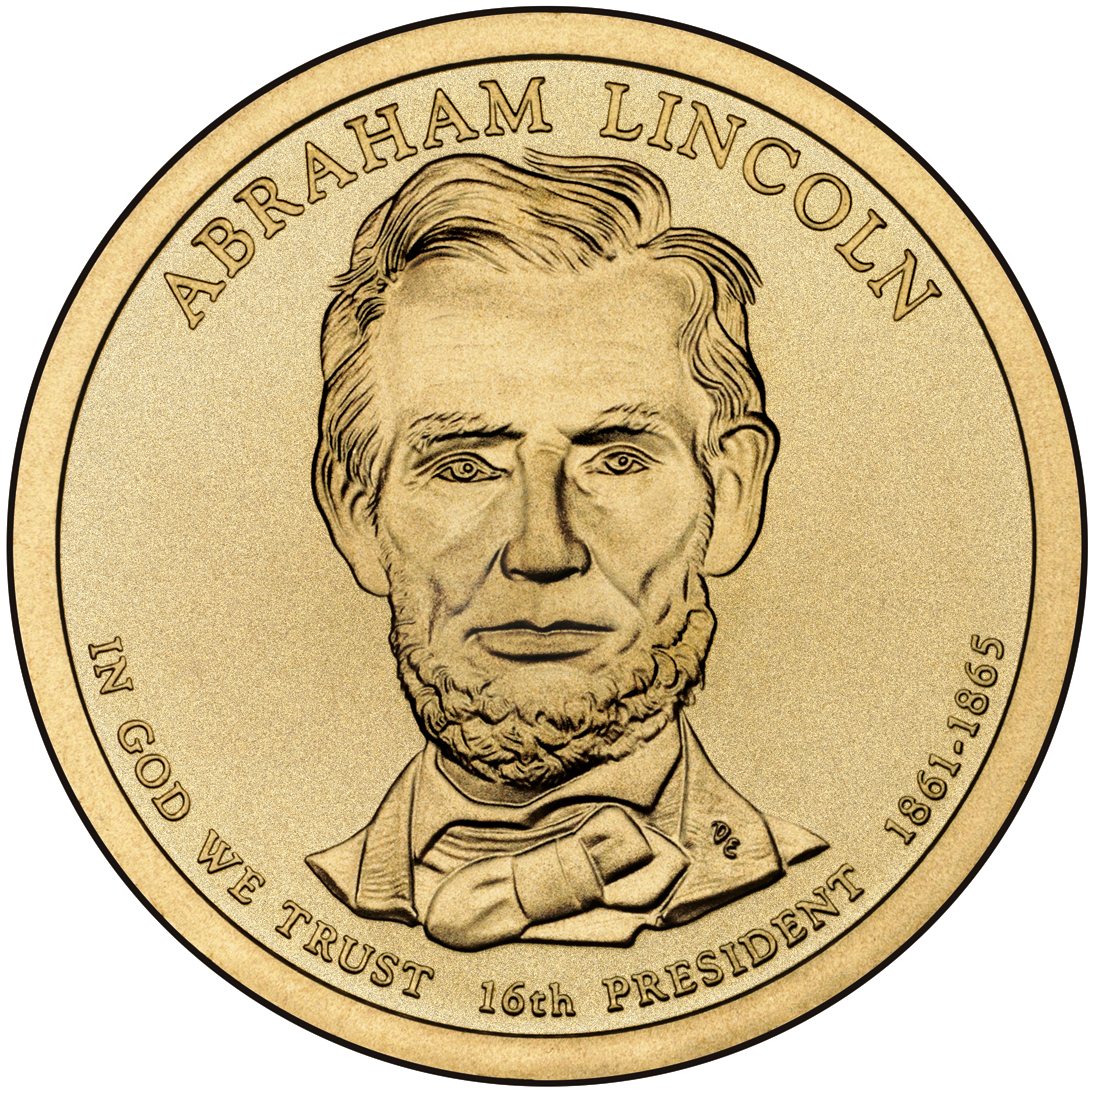 Abraham Linkcoln Gold Coin